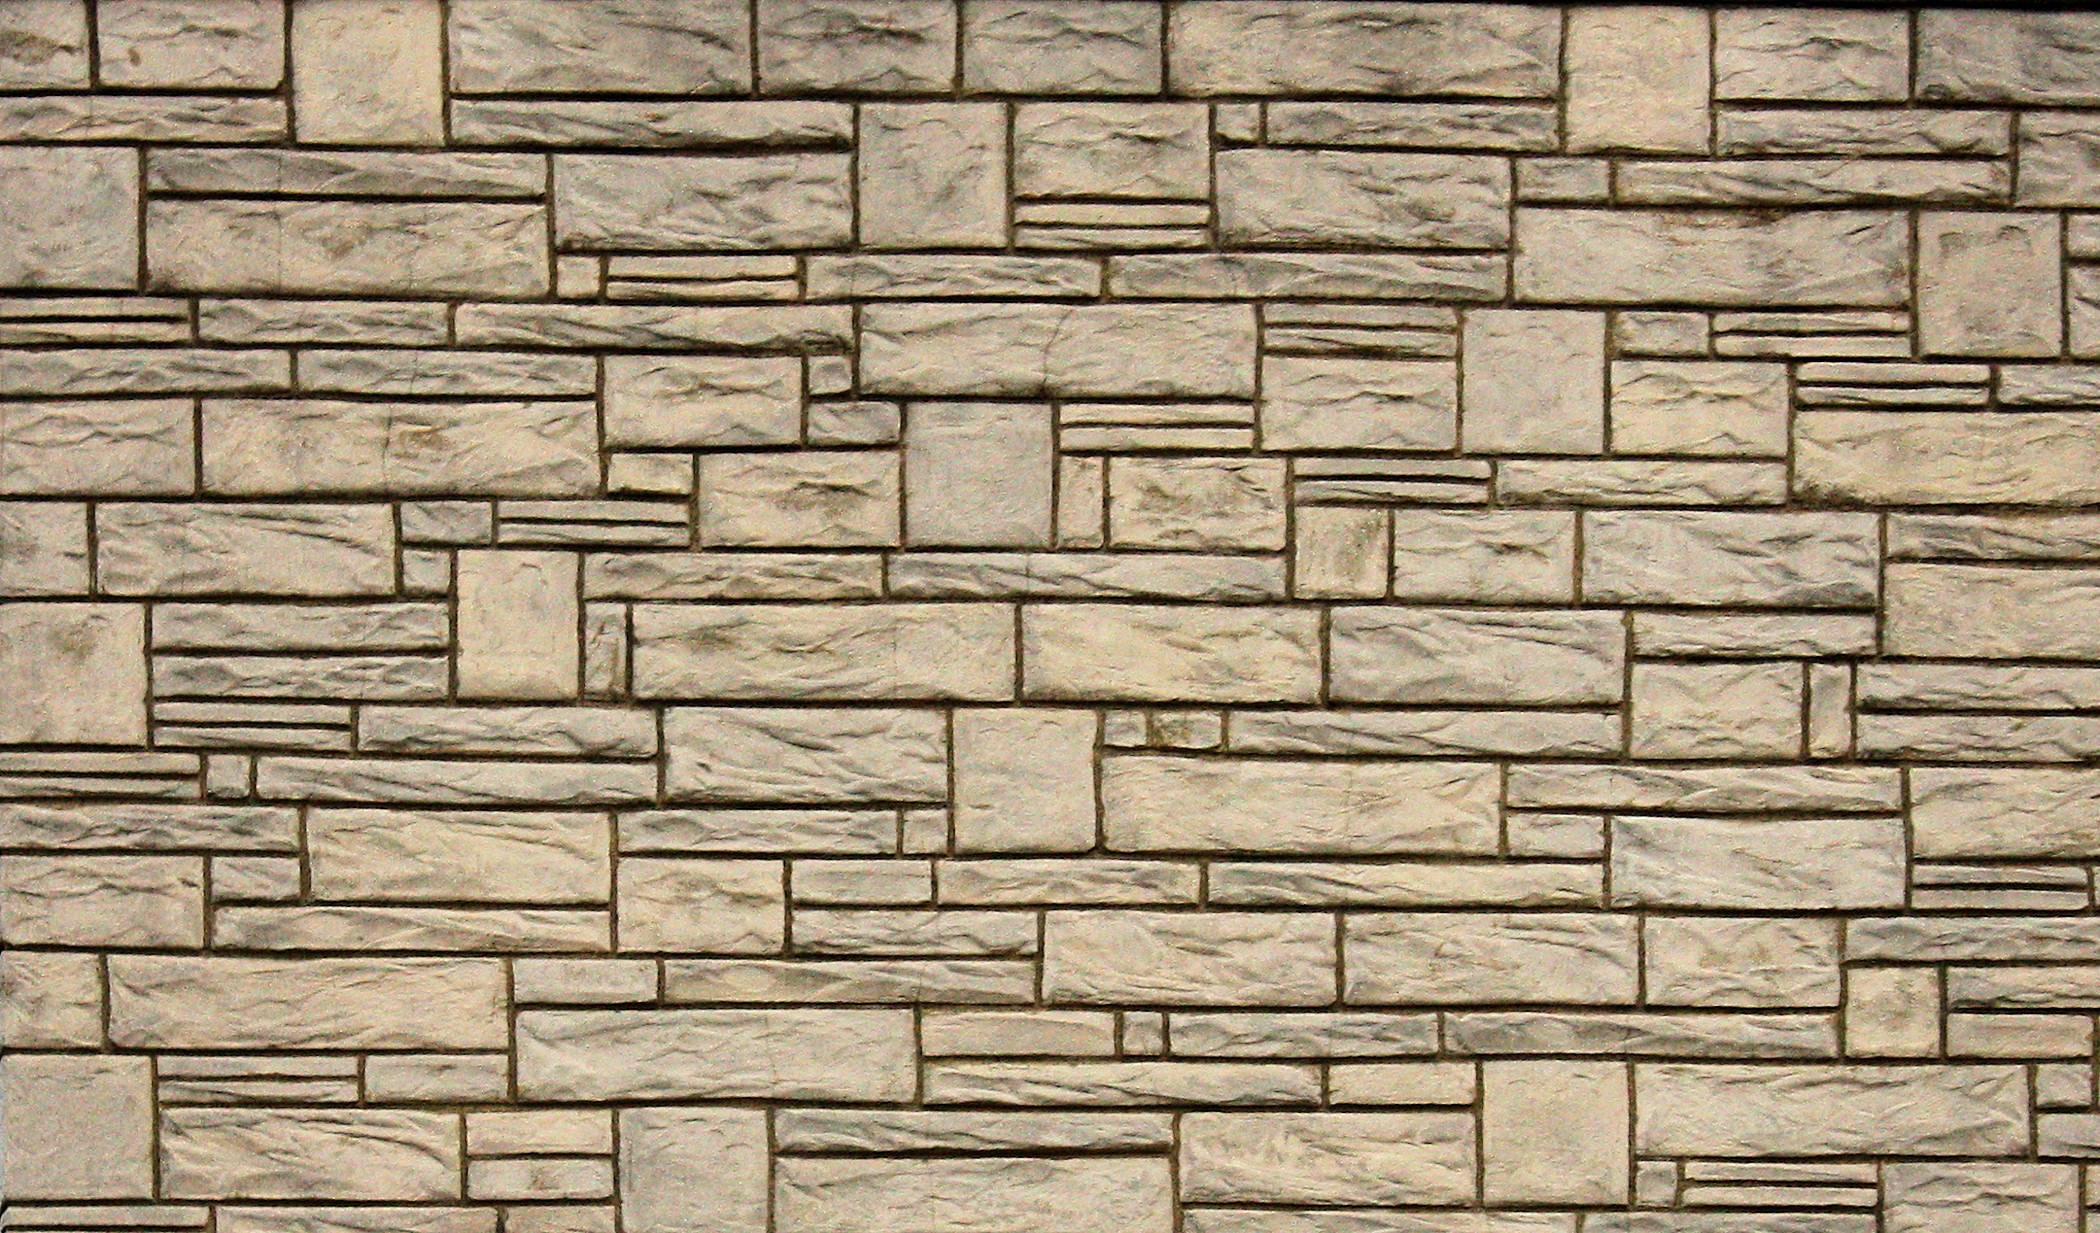 Stone Wall Wallpaper Background - Round Designs